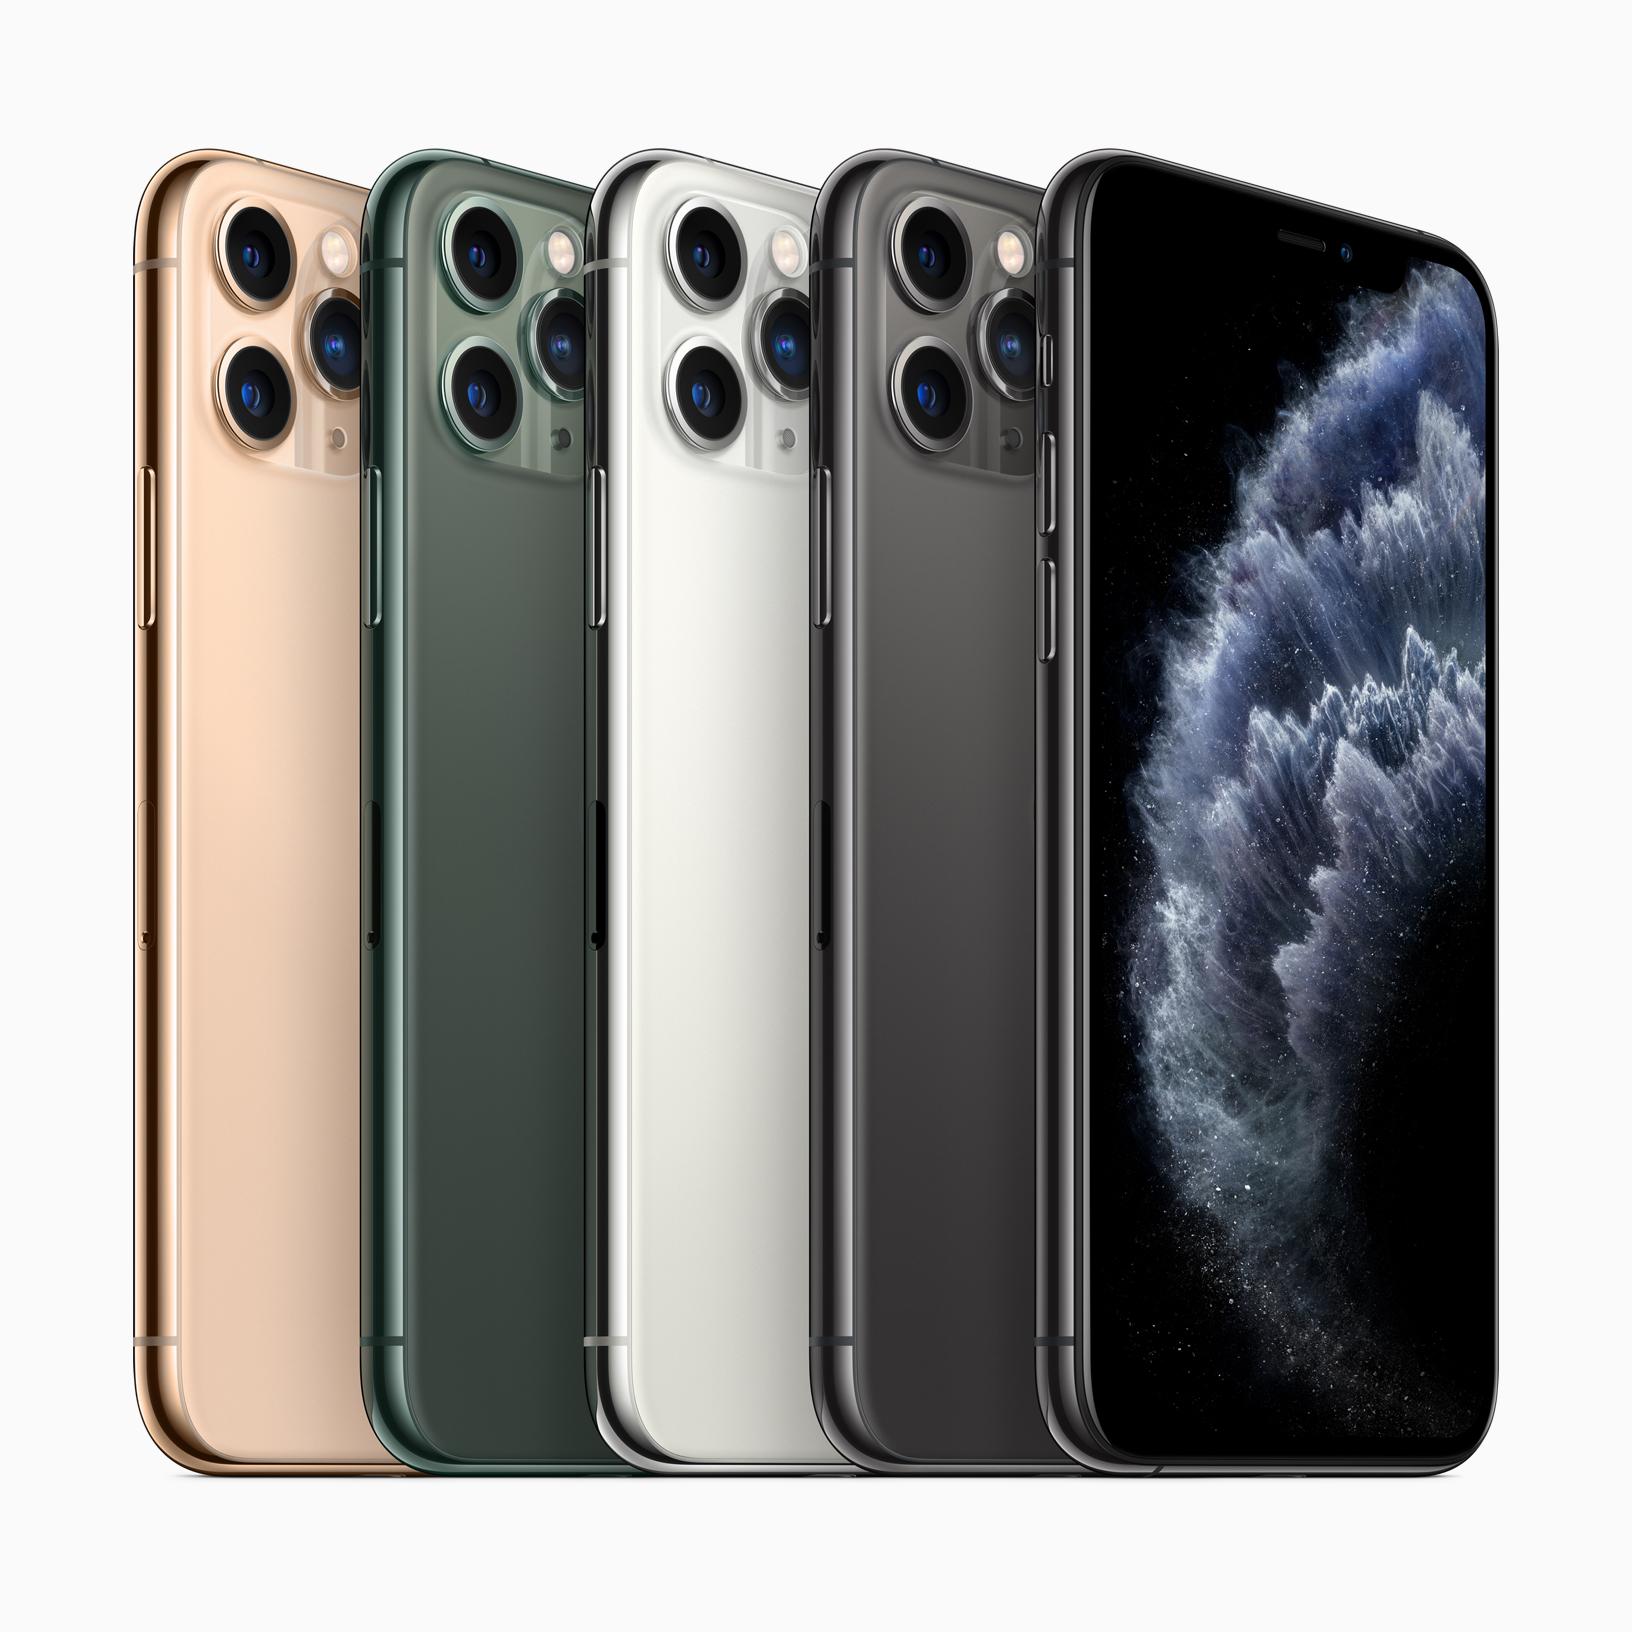 apple_iphone-11-pro_colors_091019.jpg